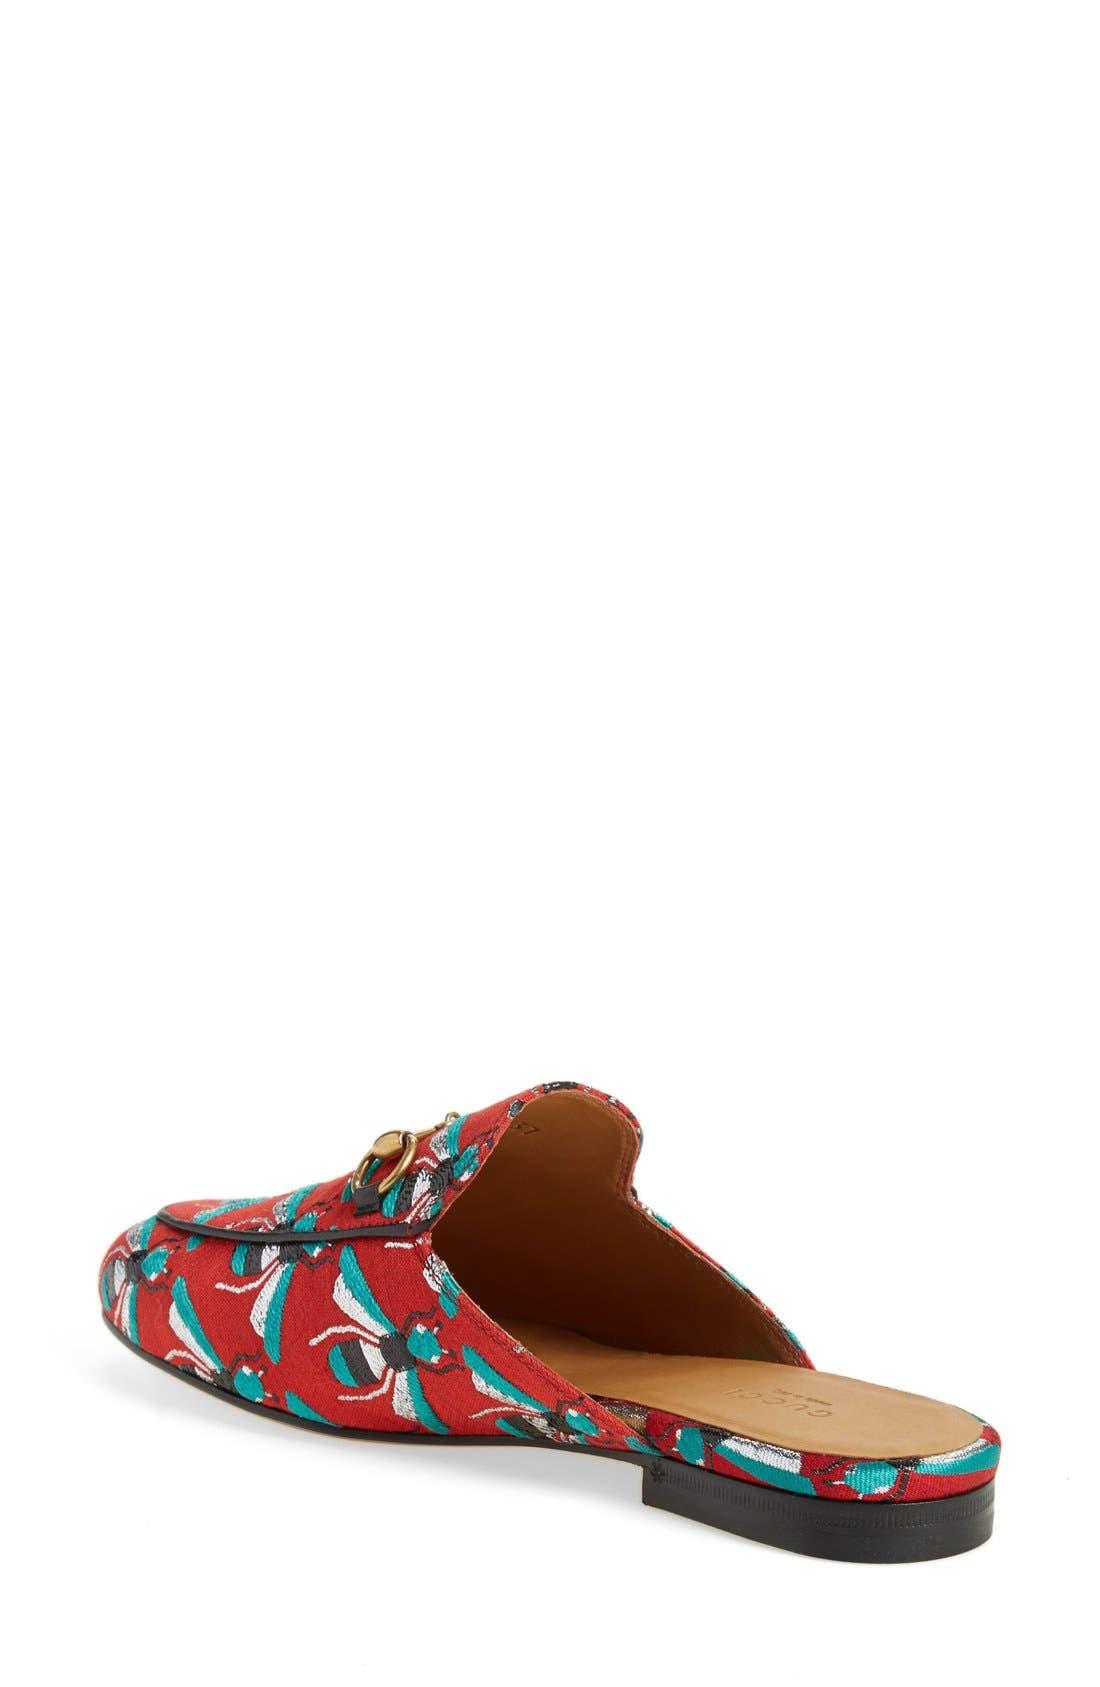 Alternate Image 2  - Gucci 'Princetown' Print Mule Loafer (Women)